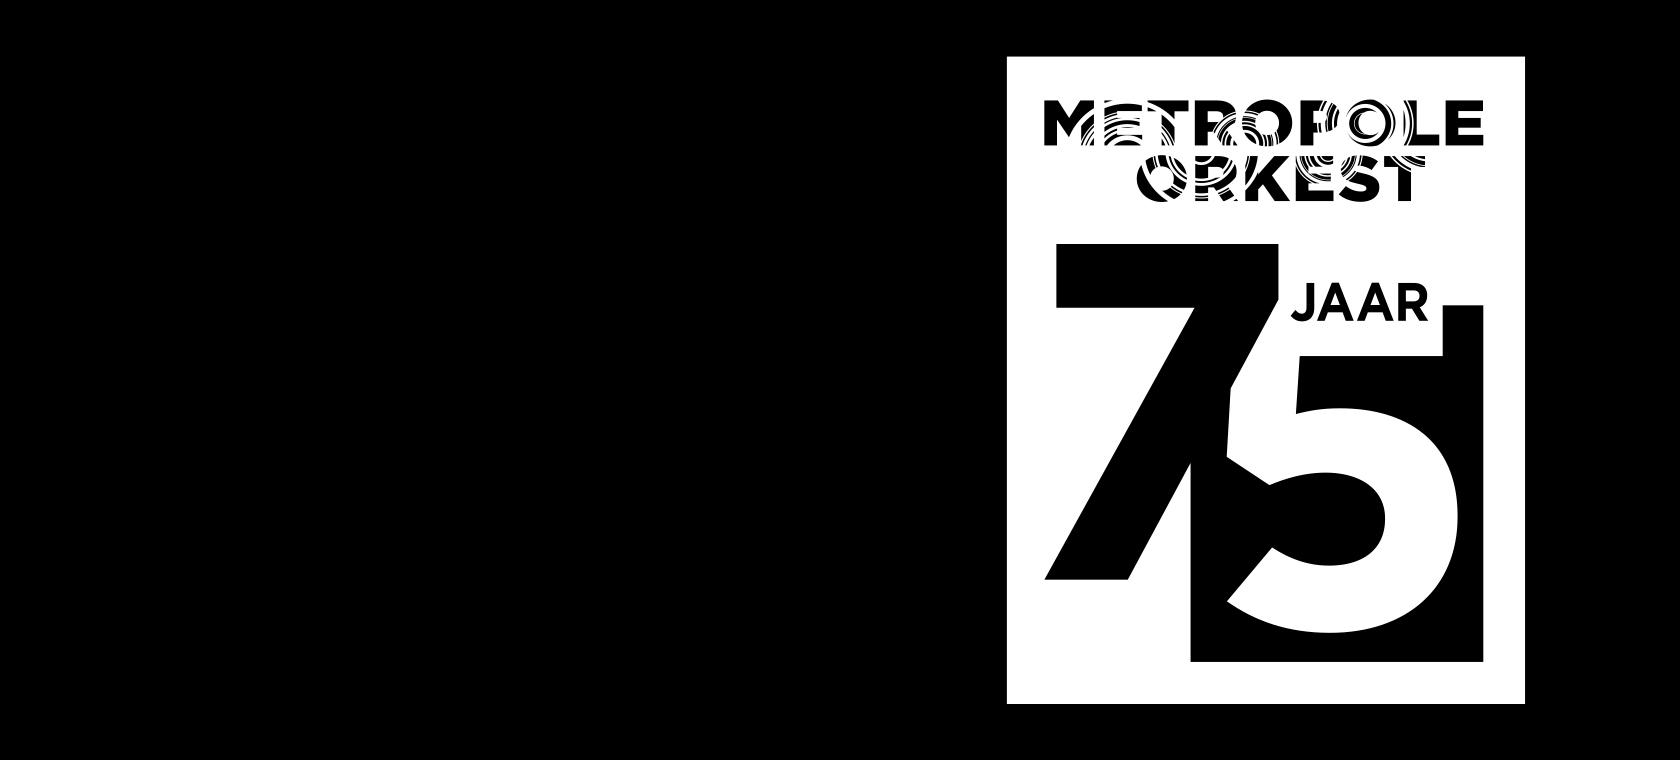 Metropole Orkest & Marcel Veenendaal - The Show Must Go On